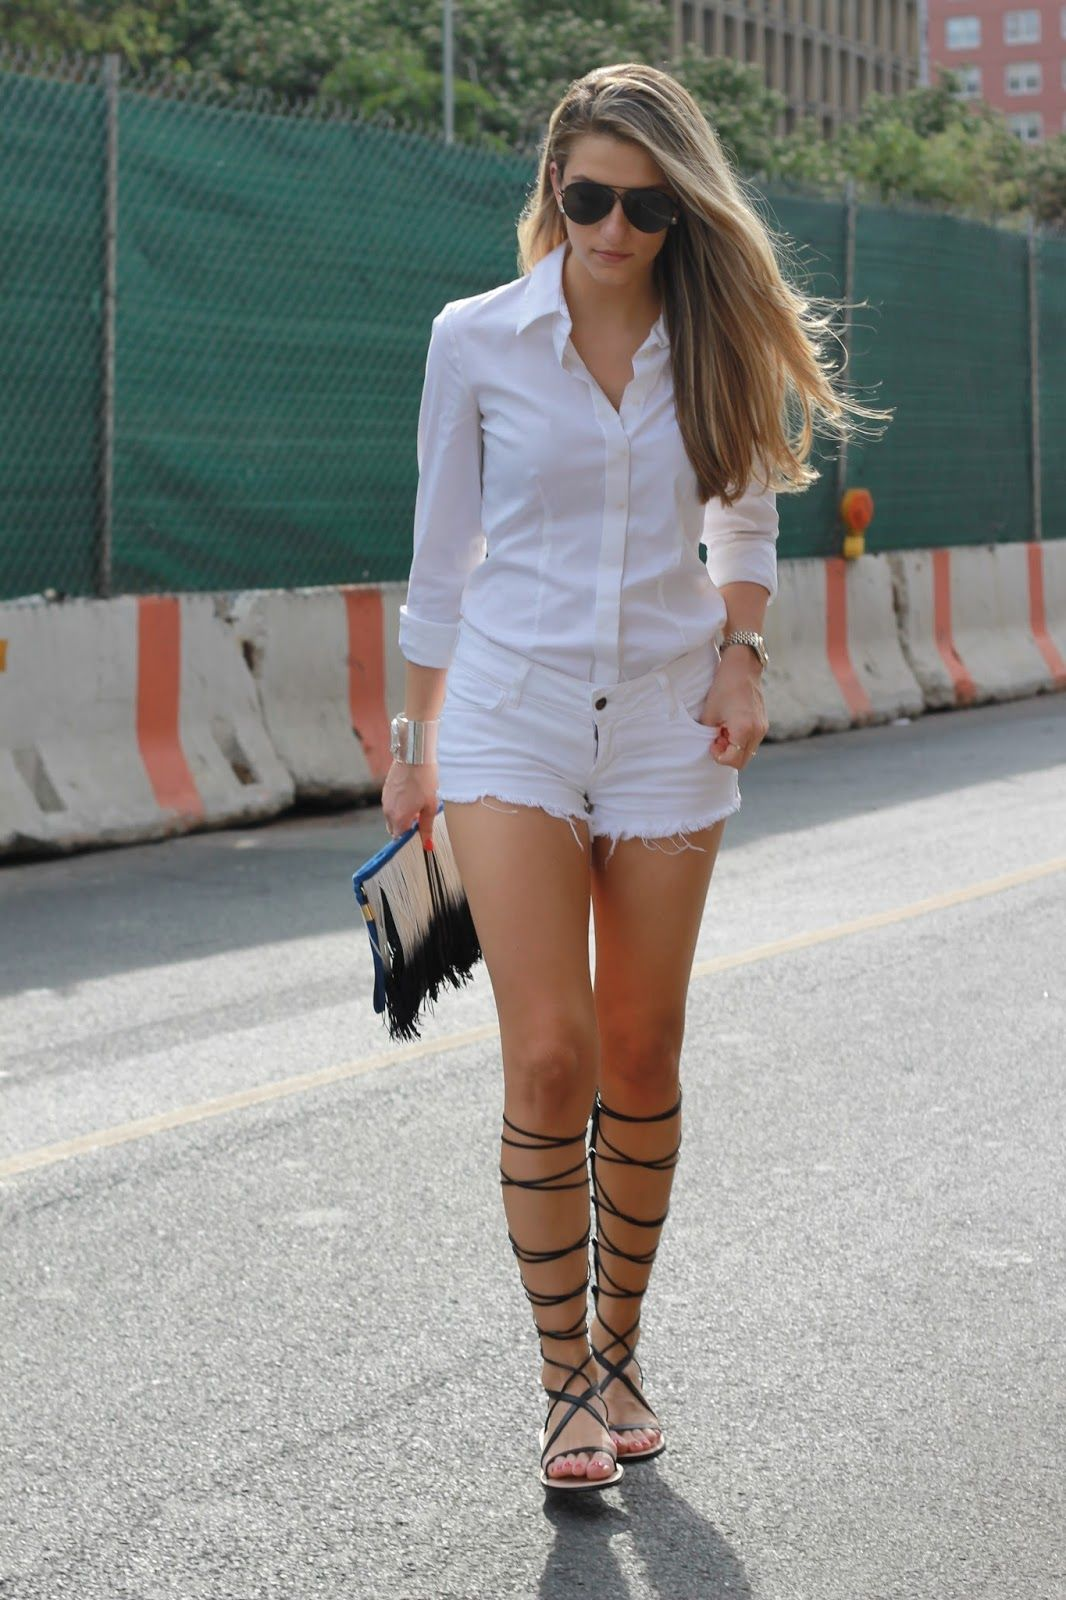 all white look 2015, white cutoff outfits, white denim shorts ...